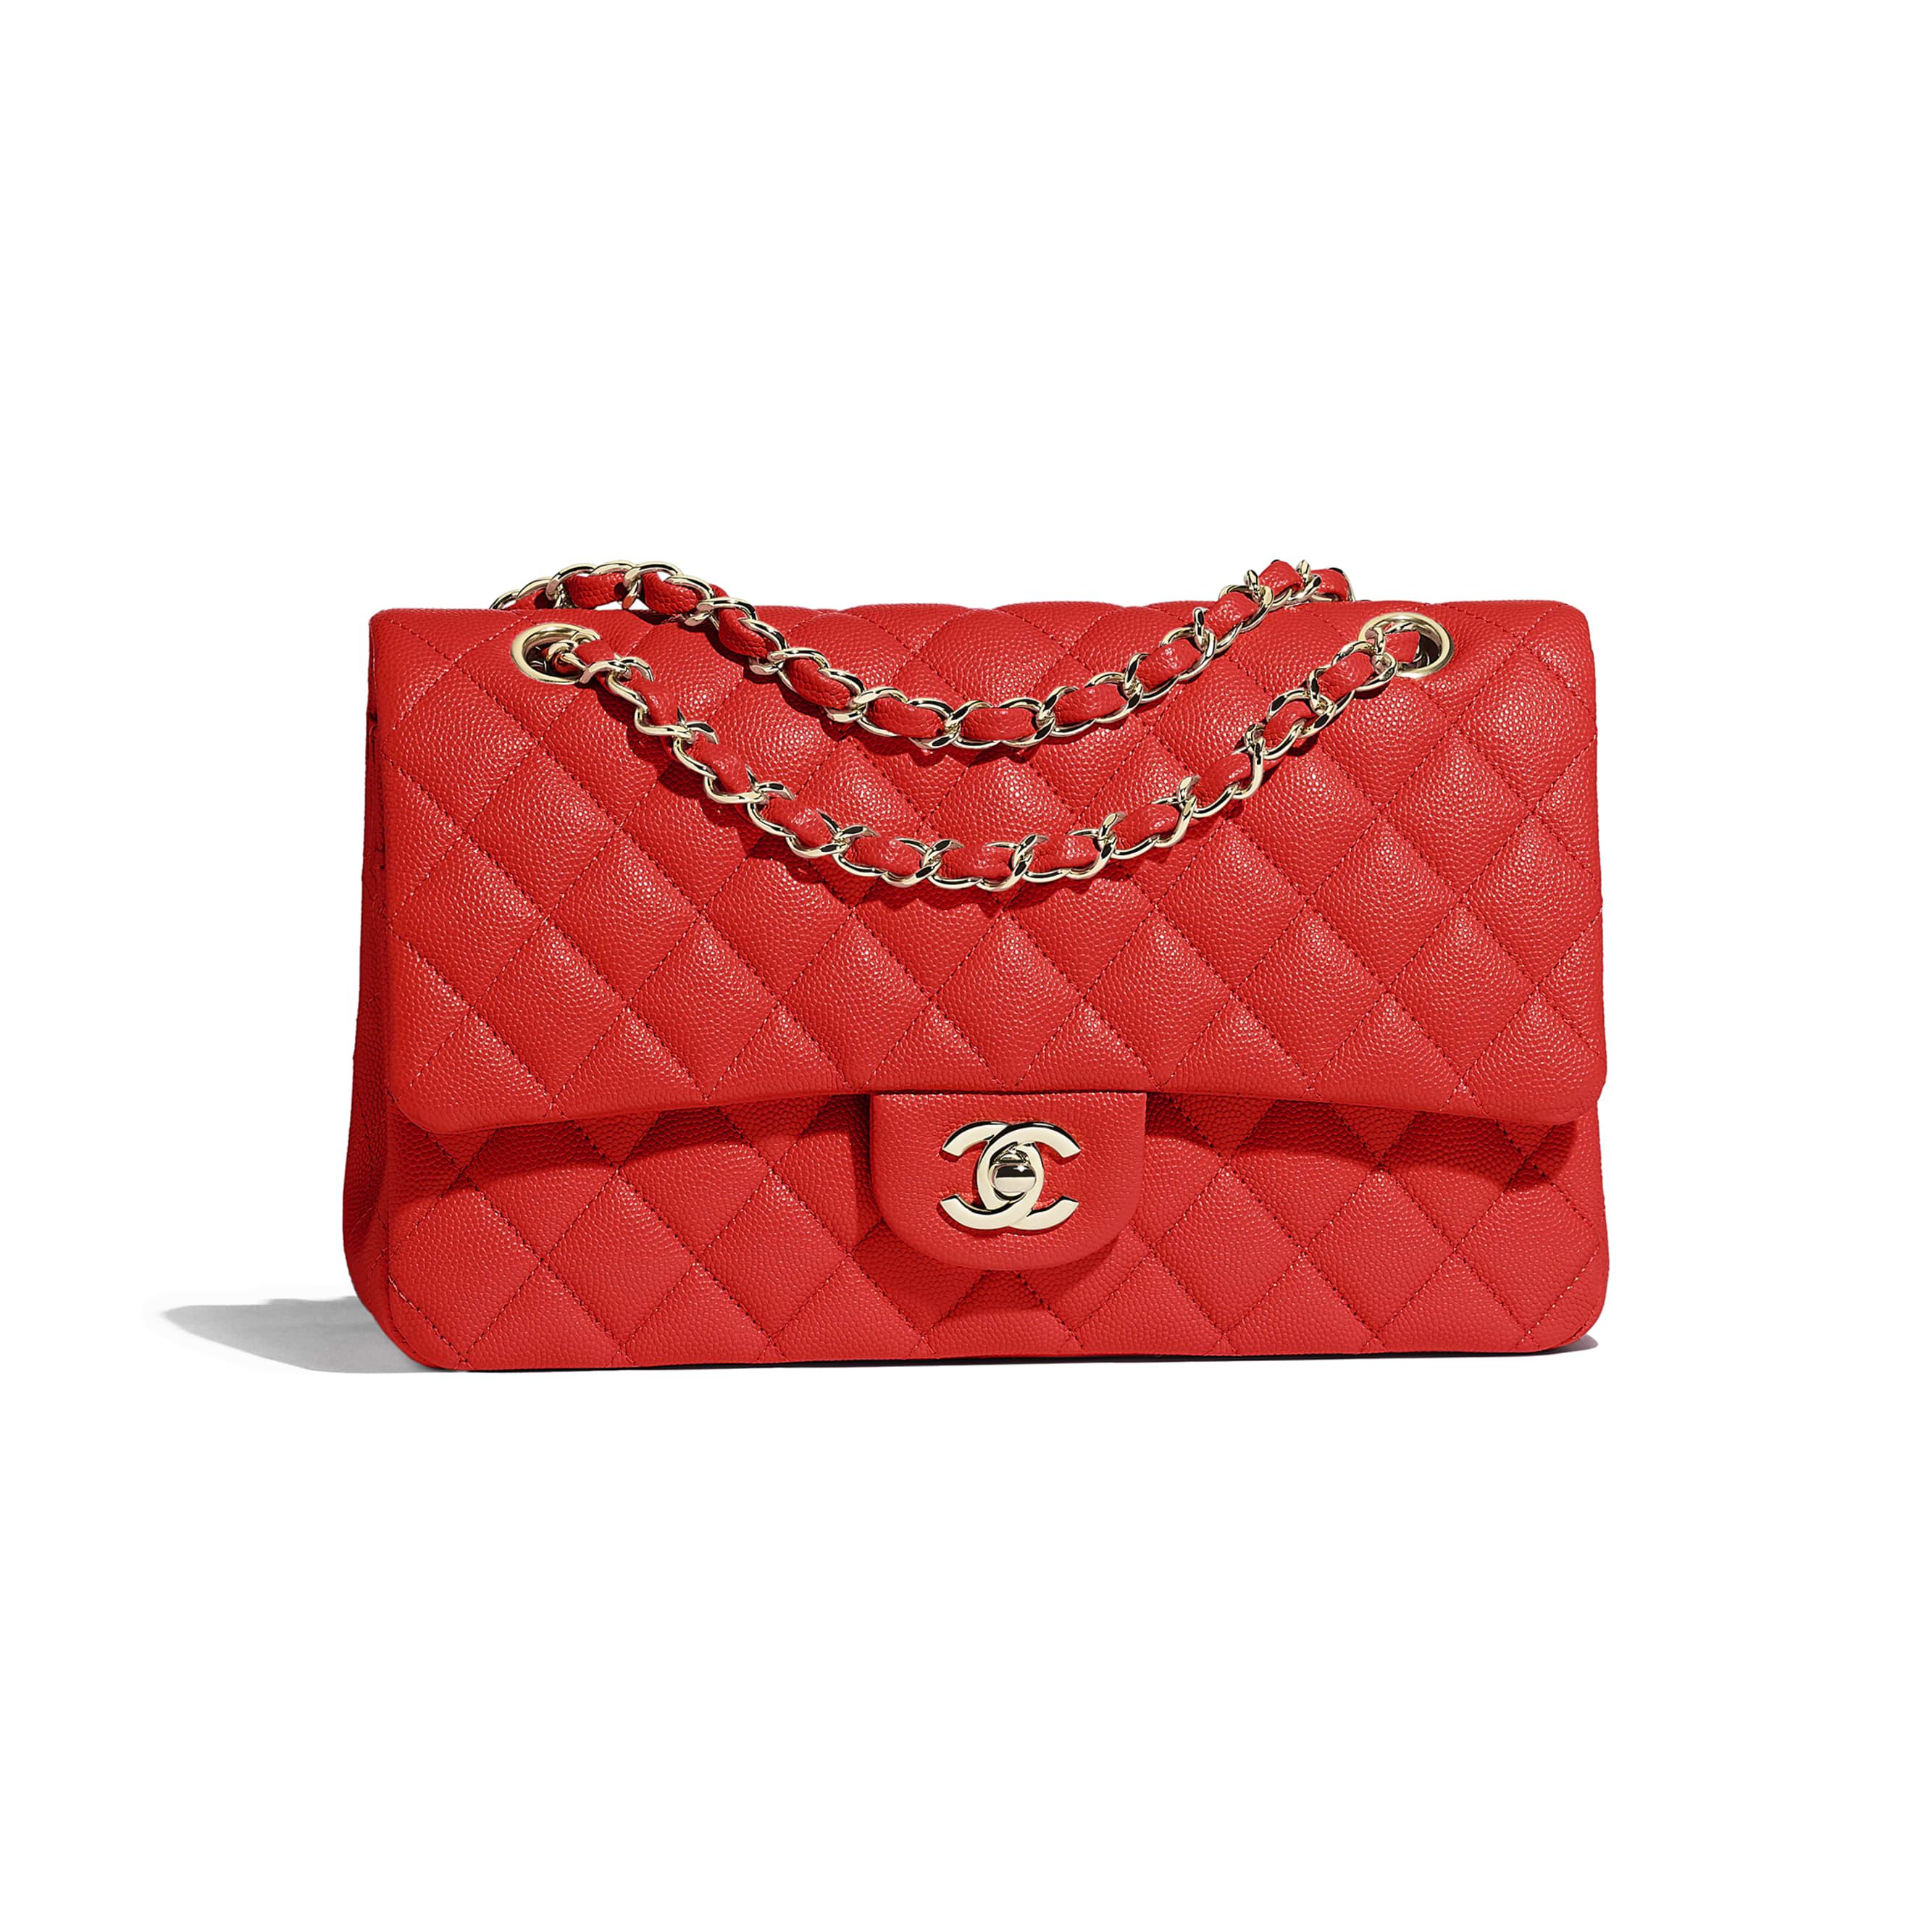 85807f1ee46f ... Classic Handbag - Red - Grained Calfskin   Gold-Tone Metal - Default  view -